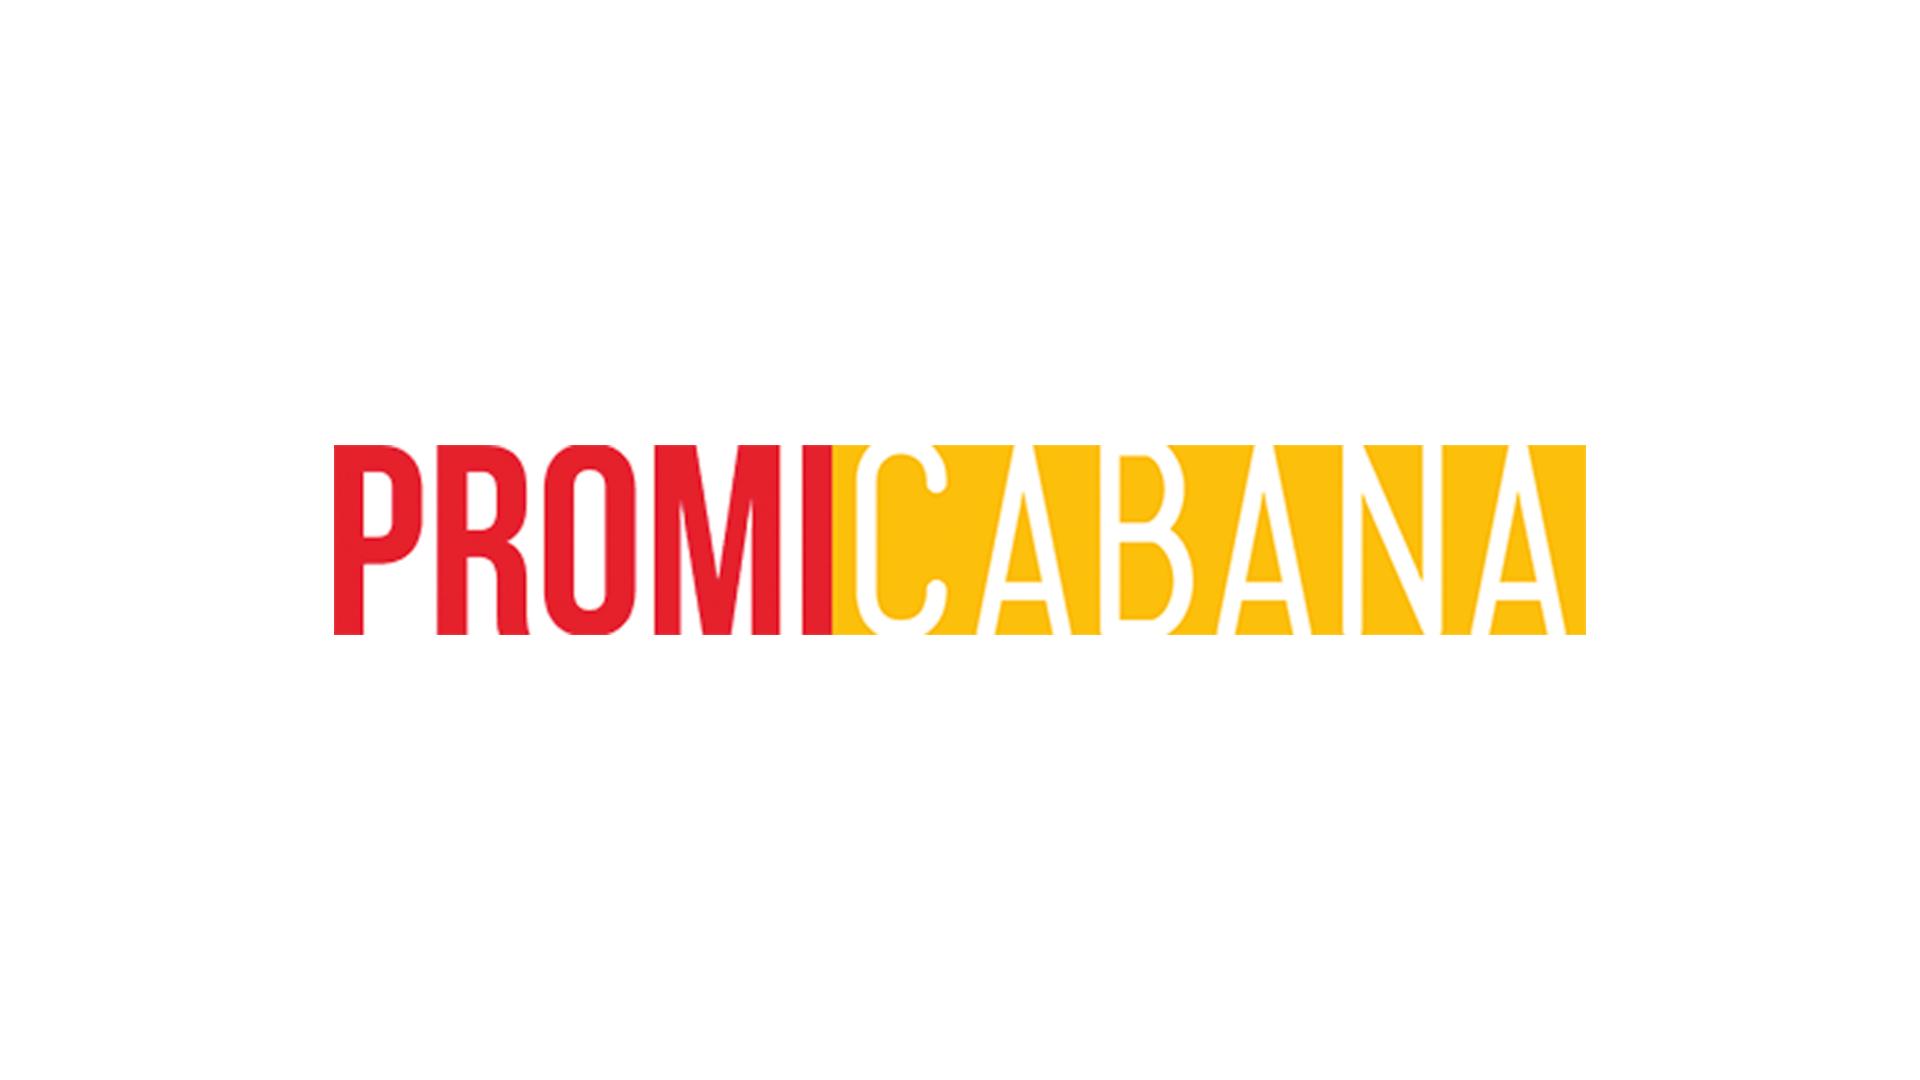 Josh-Hutcherson-Robert-Pattinson